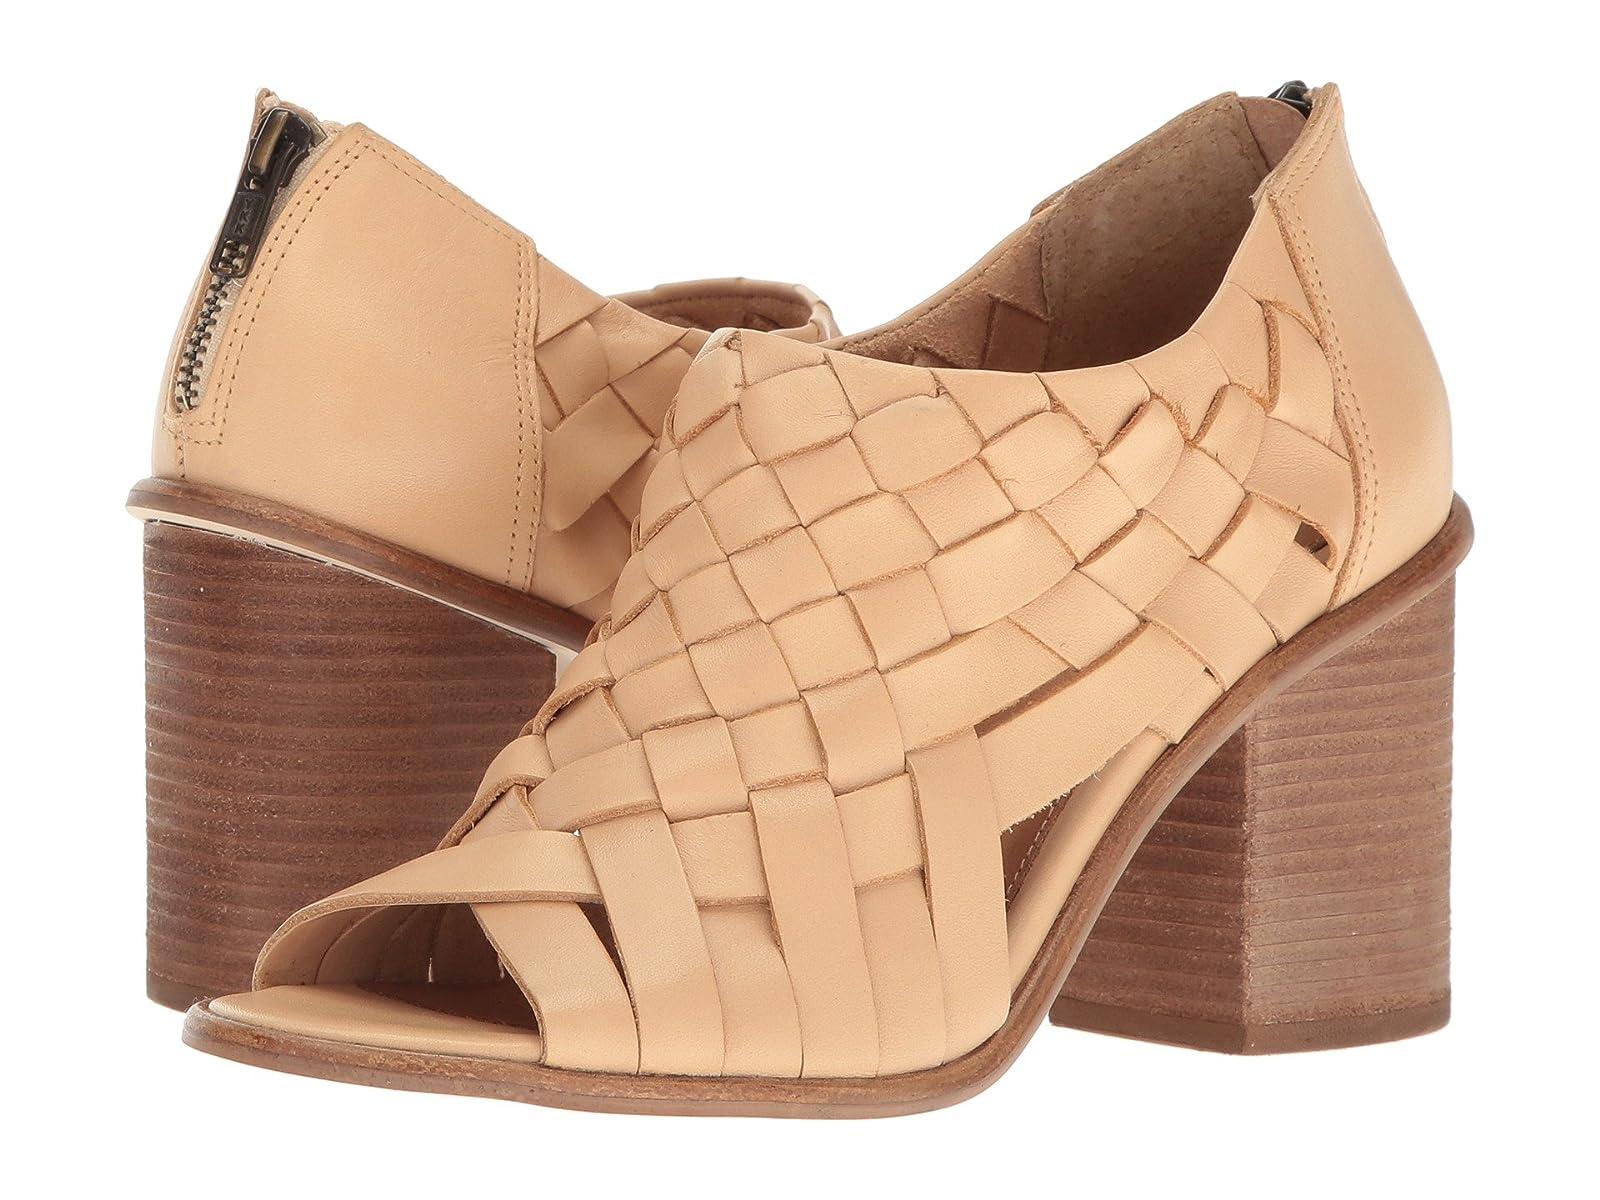 CC Corso Como SalemCheap and distinctive eye-catching shoes